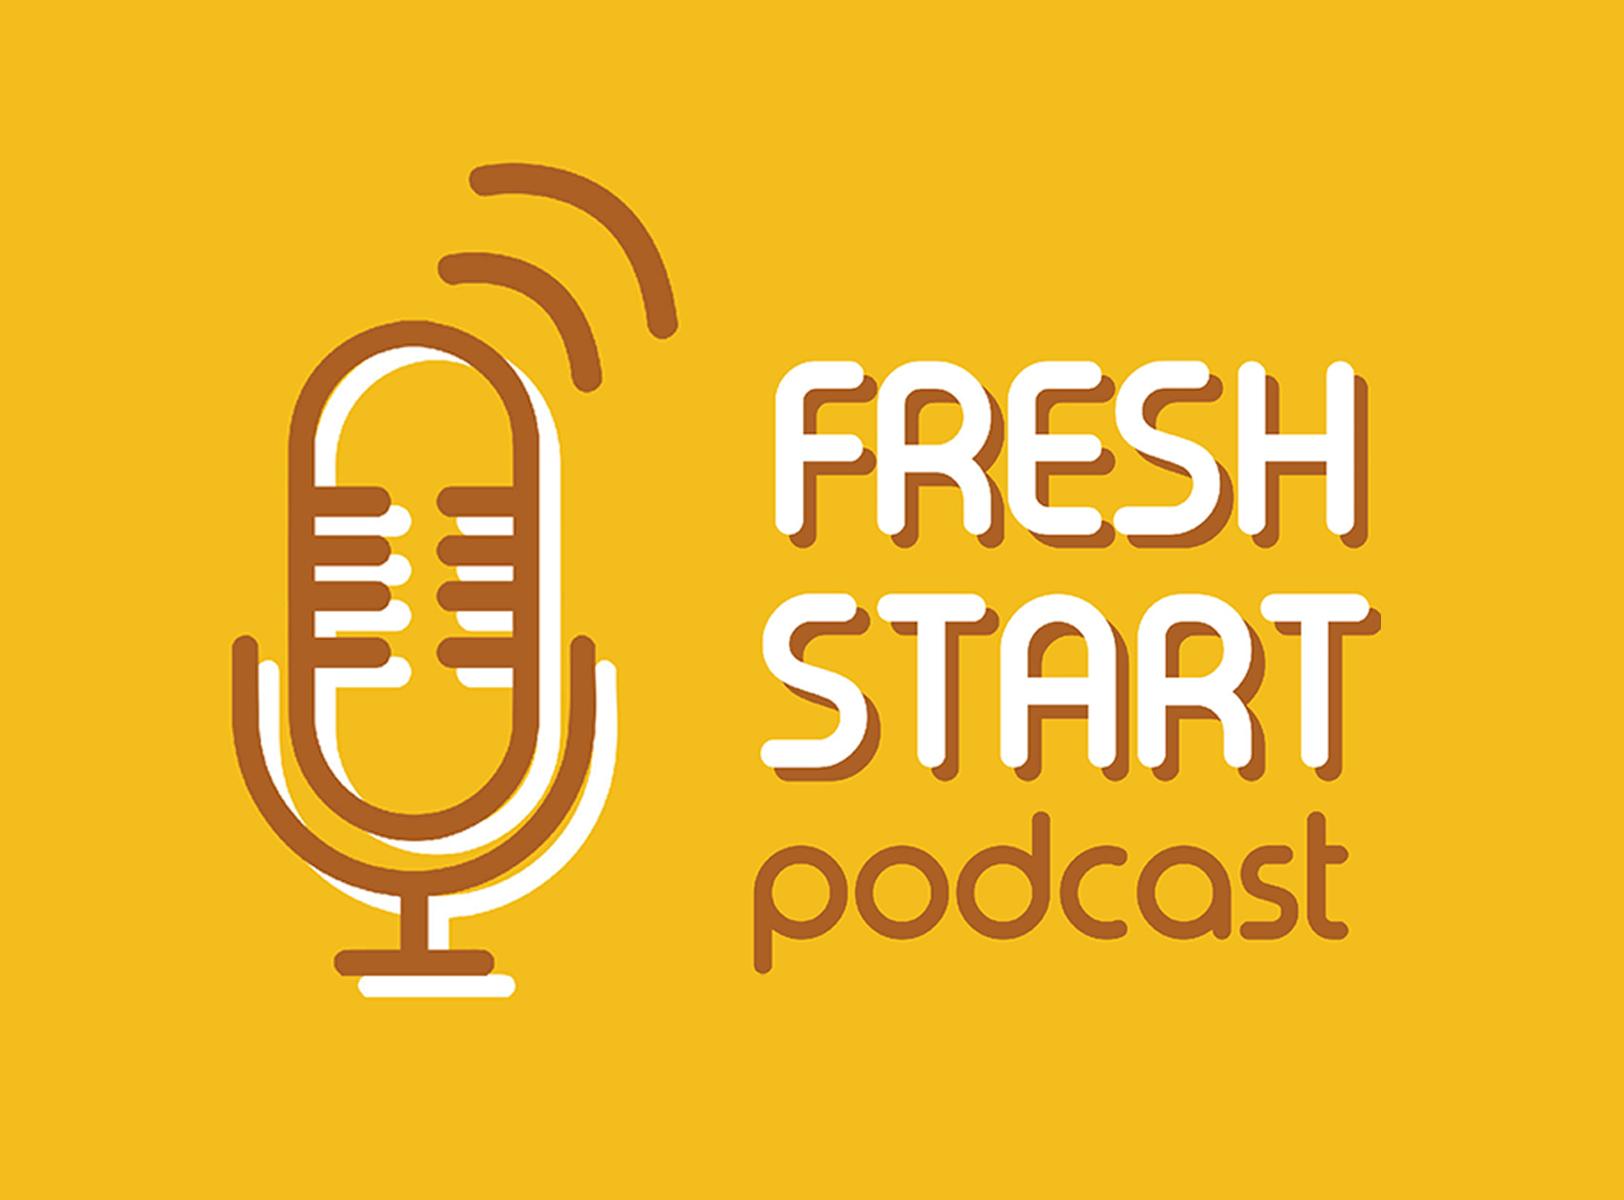 Fresh Start: Podcast News (8/30/2019 Fri.)